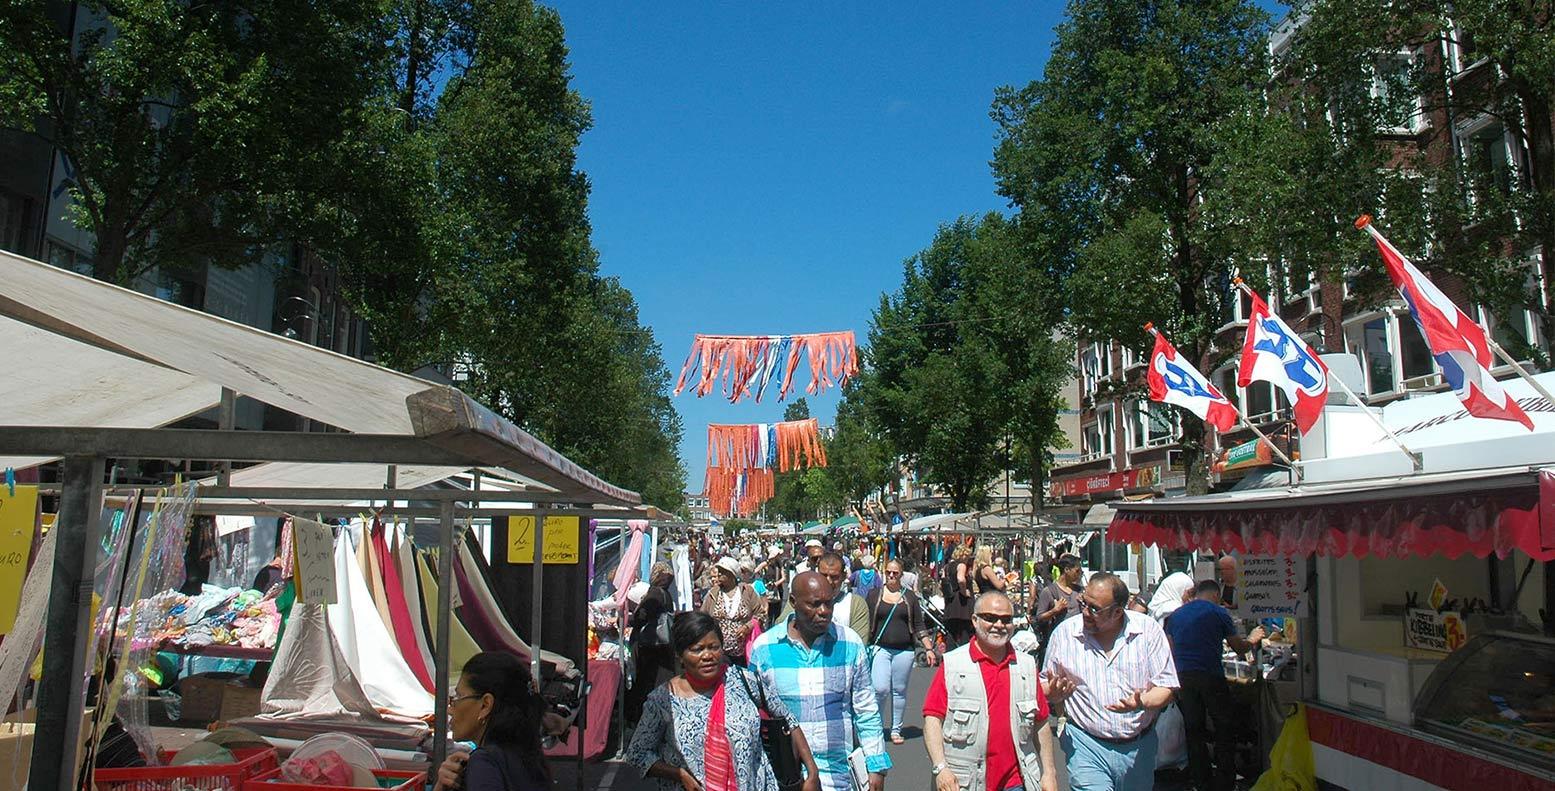 Dappermarkt ter hoogte Commelinstraat gezien richting Mauritskade, oranje vlaggen hangen boven markt i.v.m. WK